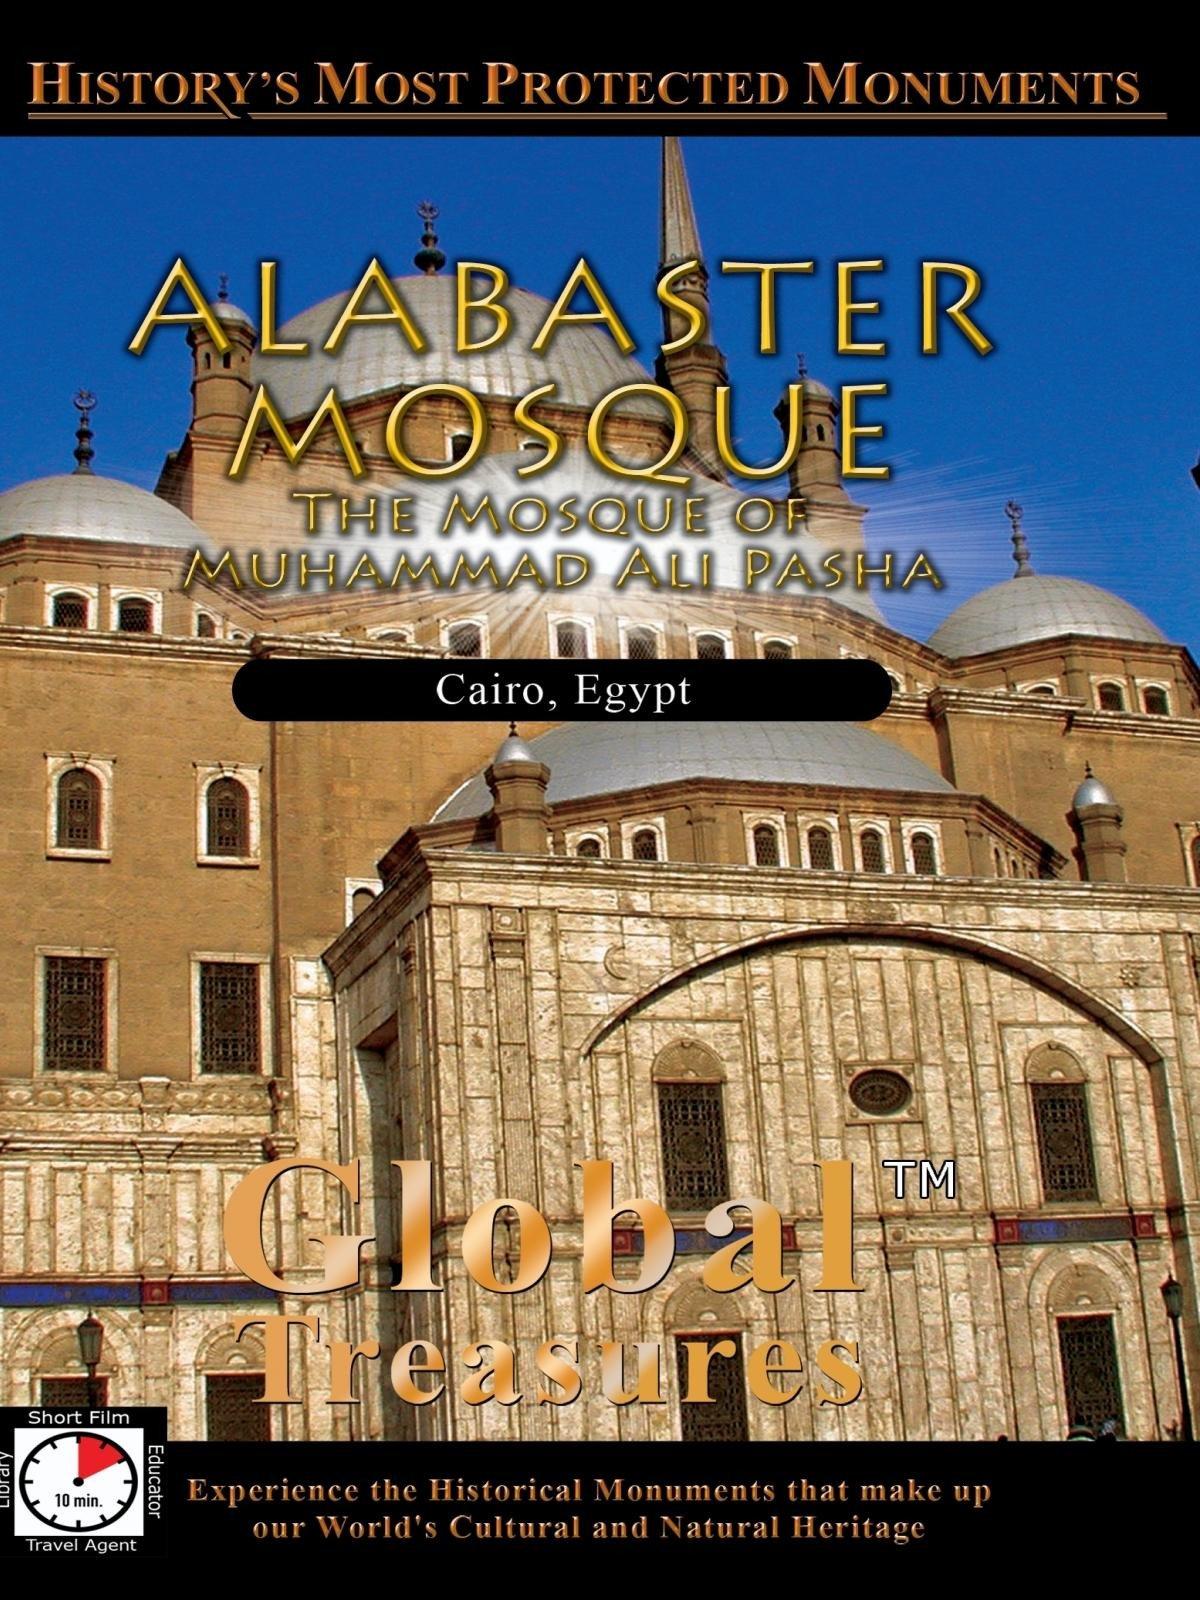 Global Treasures - Alabaster Mosque - The Mosque of Muhammad Ali Pasha - Cairo, Egypt on Amazon Prime Video UK